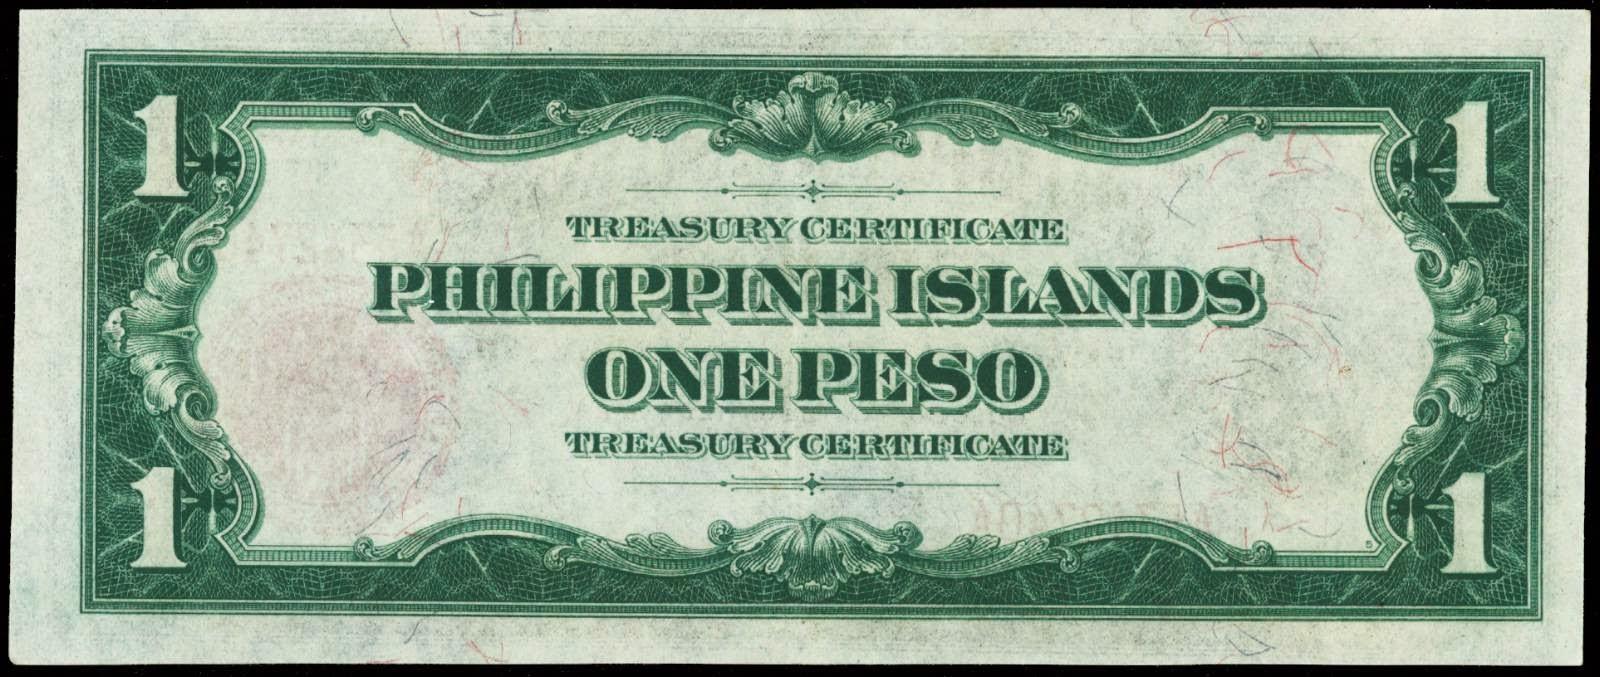 Philippine Islands paper money One Peso bill Treasury Certificate 1918